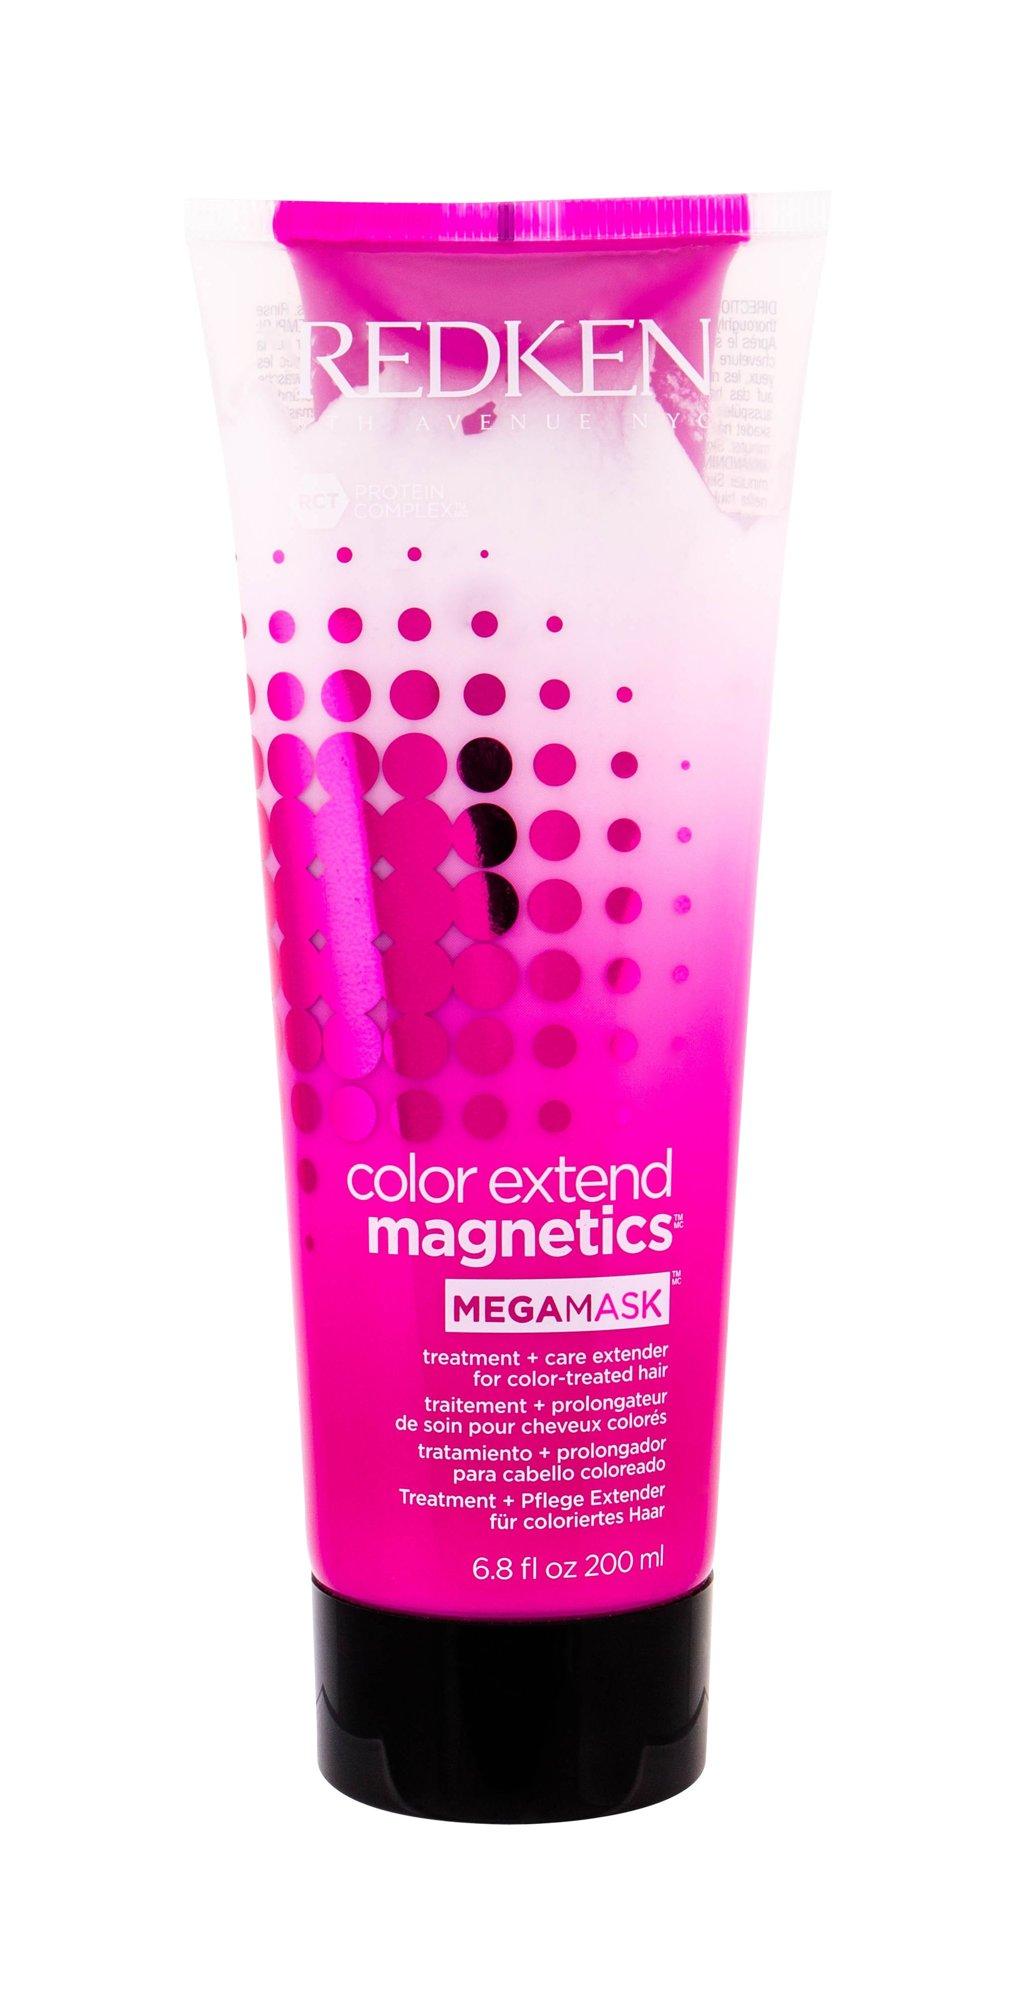 Redken Color Extend Magnetics Hair Mask 200ml